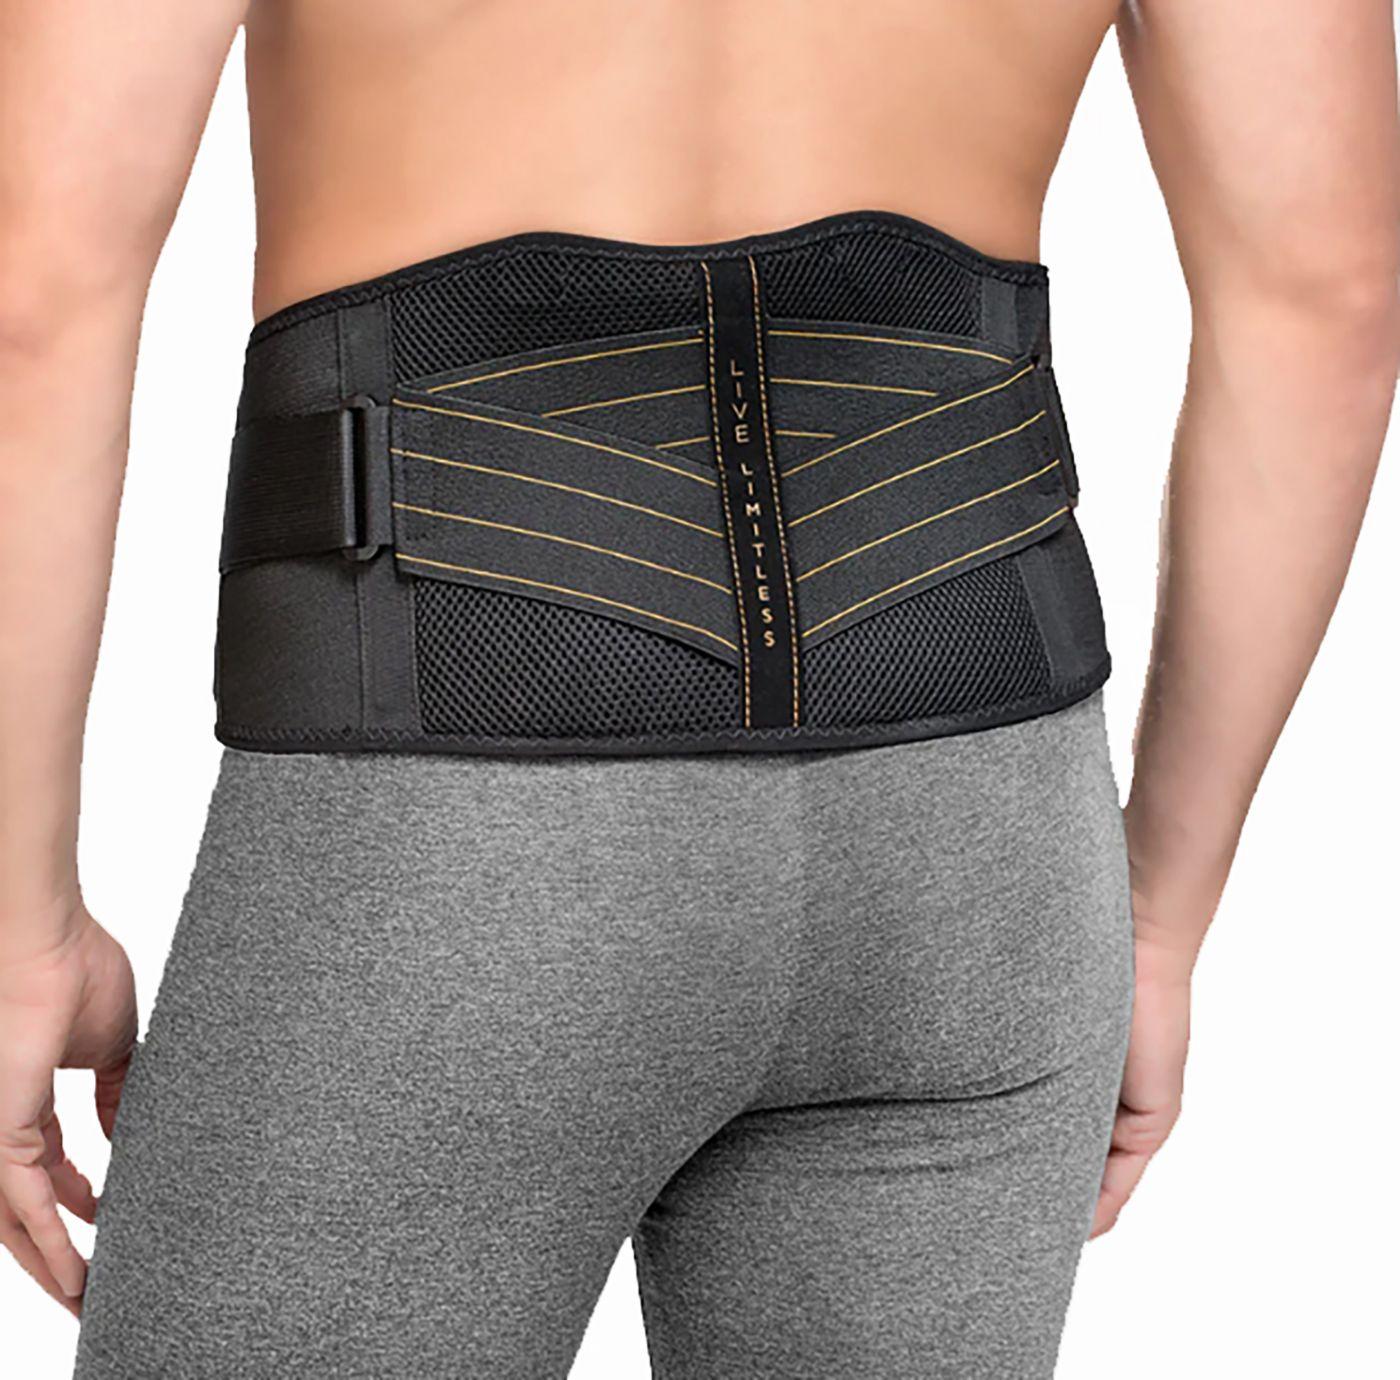 CopperFit Back Pro